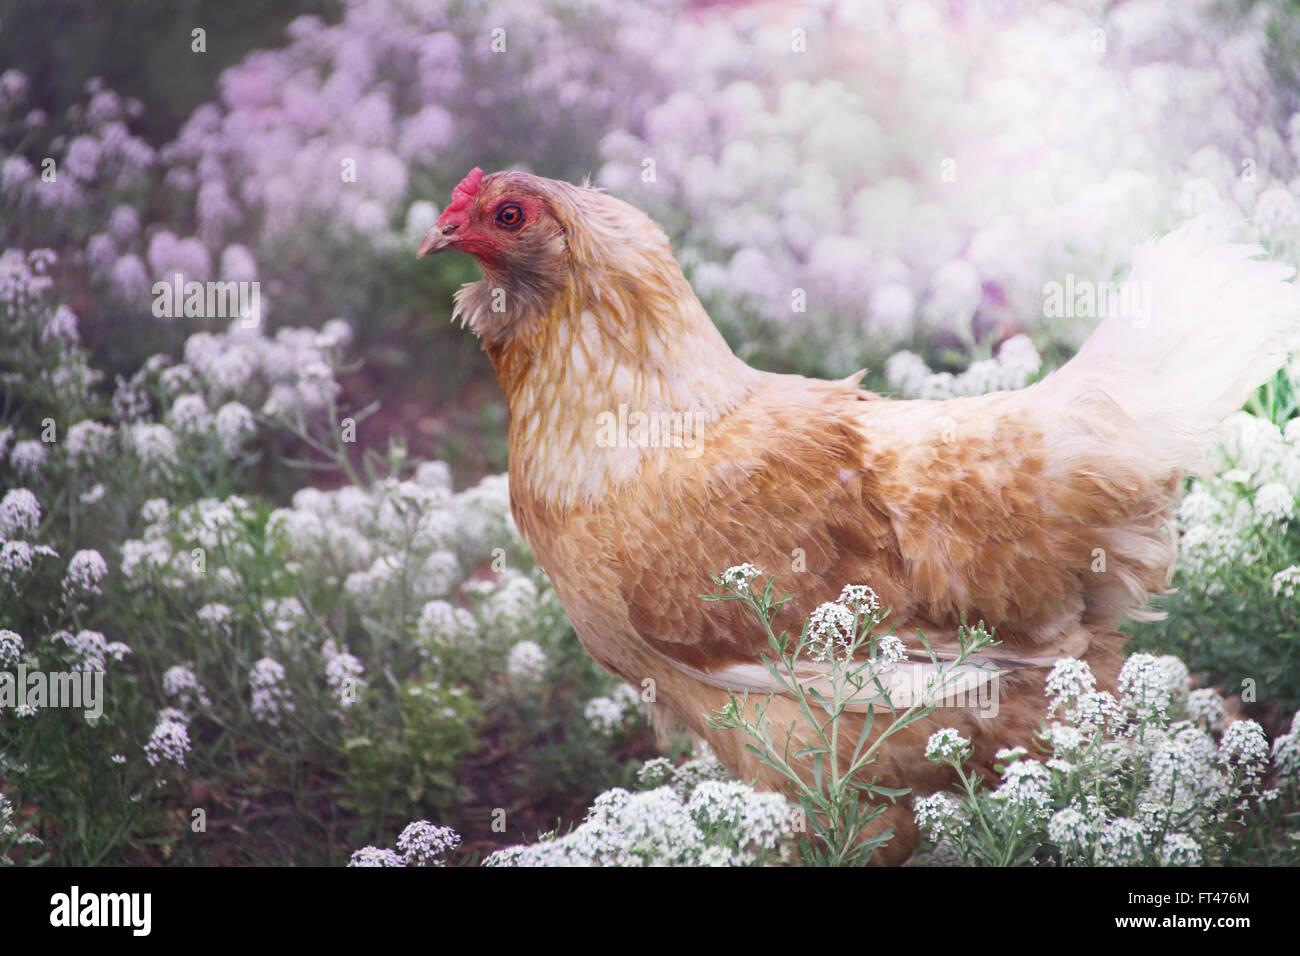 Free Range Chicken in a Field of Wildflowers. - Stock Image